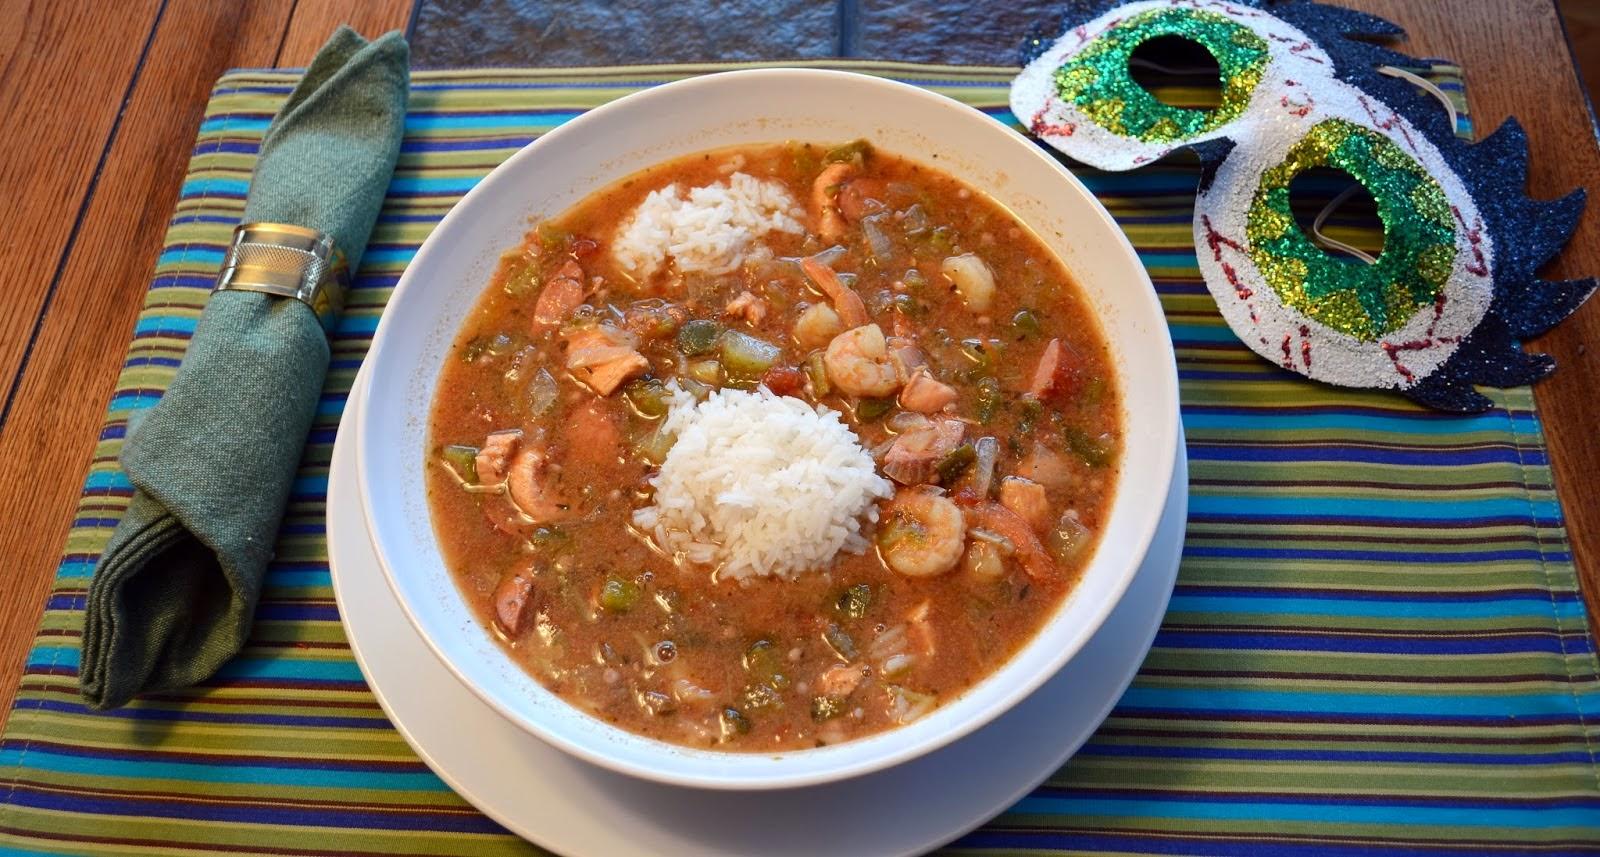 gluten-free, gumbo, slow cooker, crockpot, dinner